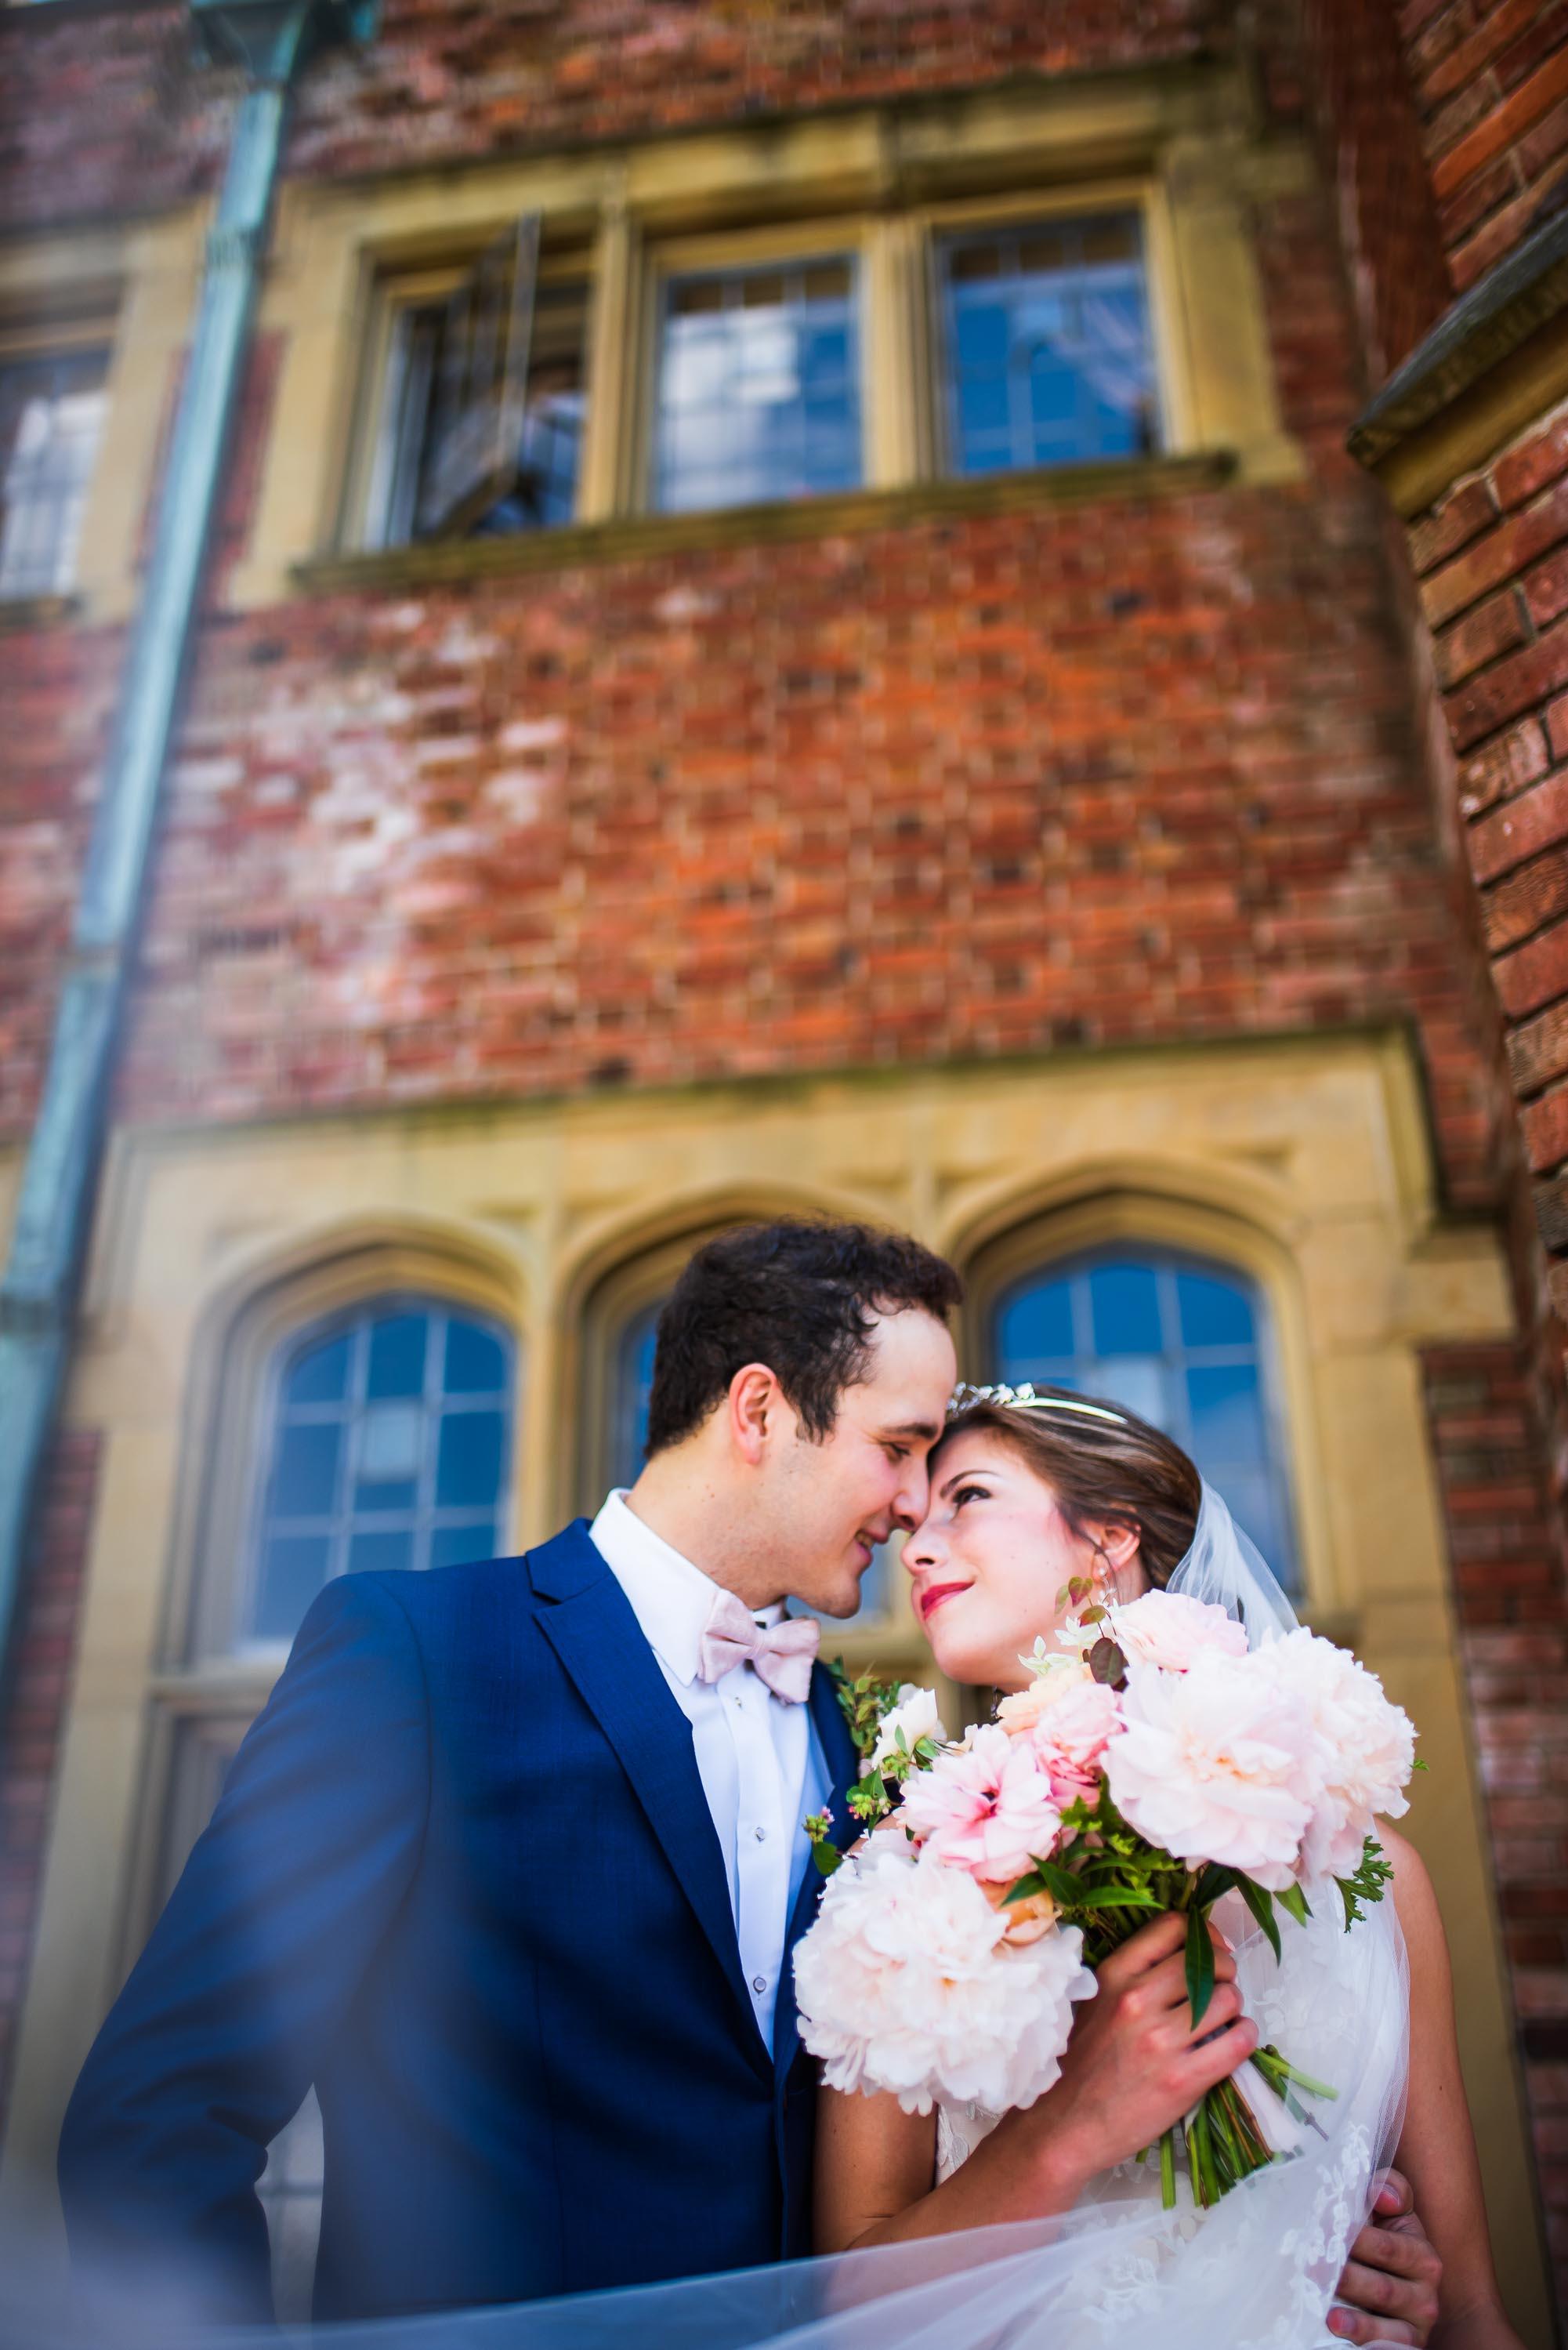 thornewood castle wedding 27.jpg